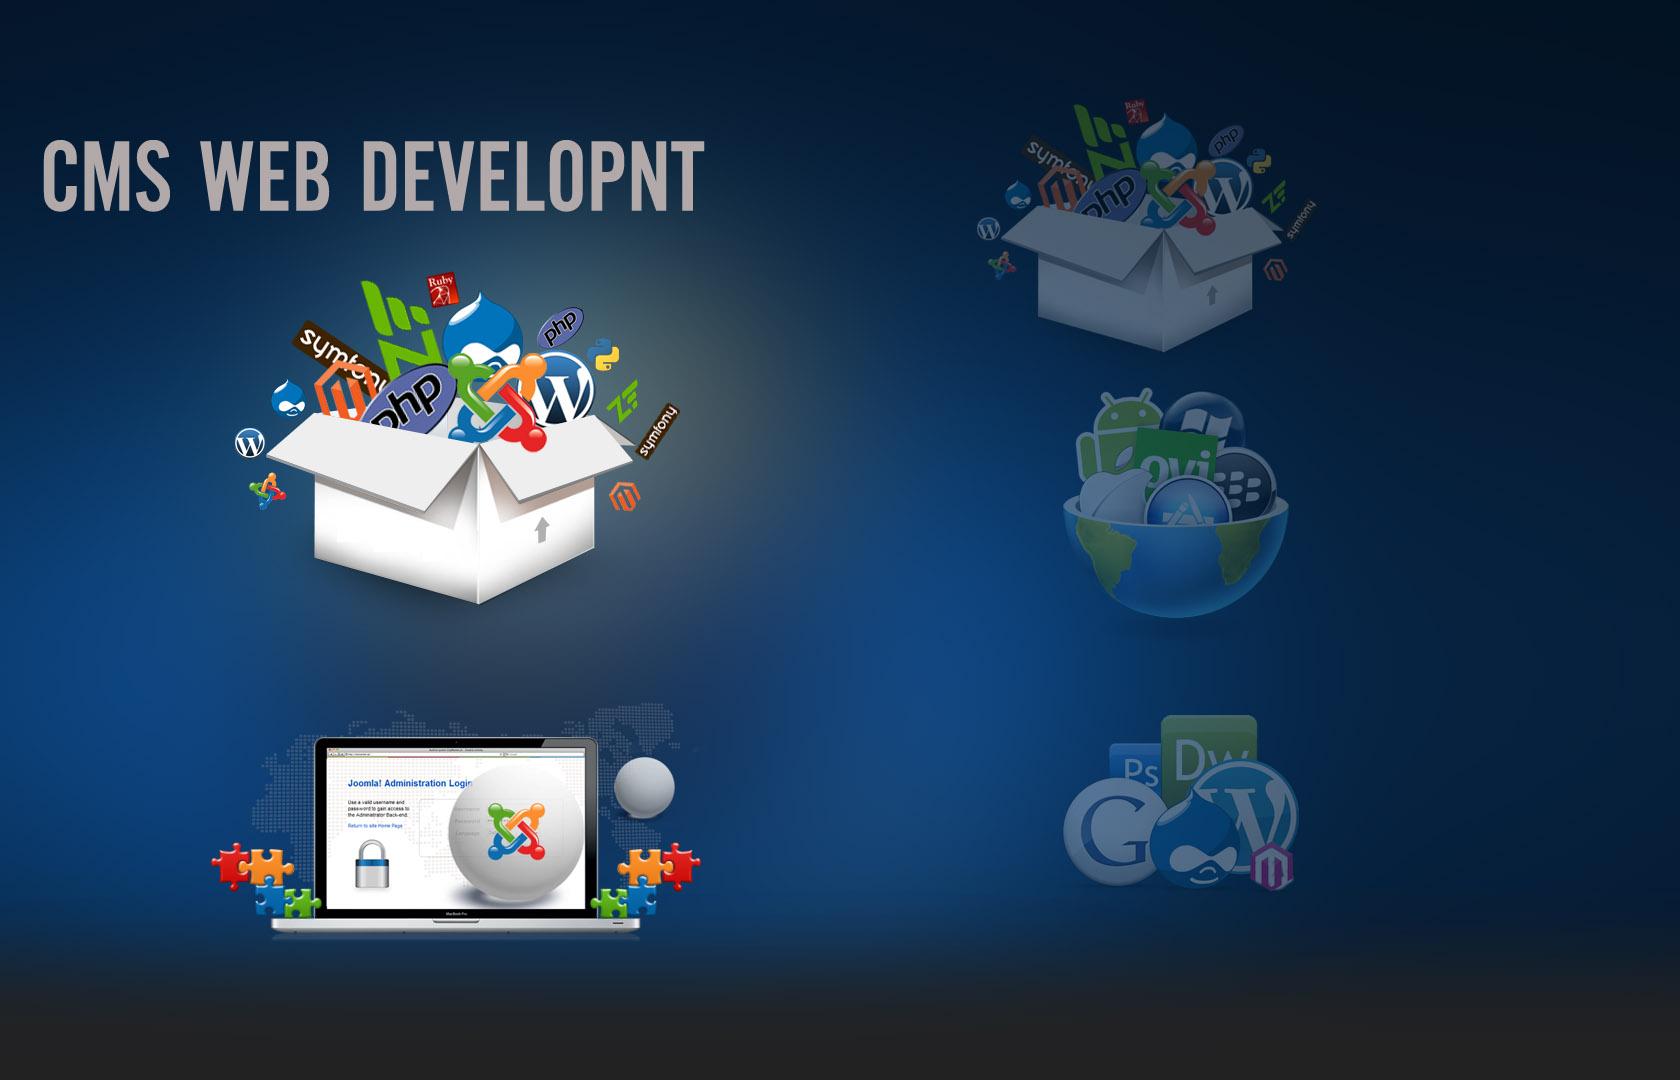 Cms Web Development Hyderabad Cms Website Development Services Cms Website Design Hyderabad Content Management Website Development Hyderabad Cms Web Services Hyderabad